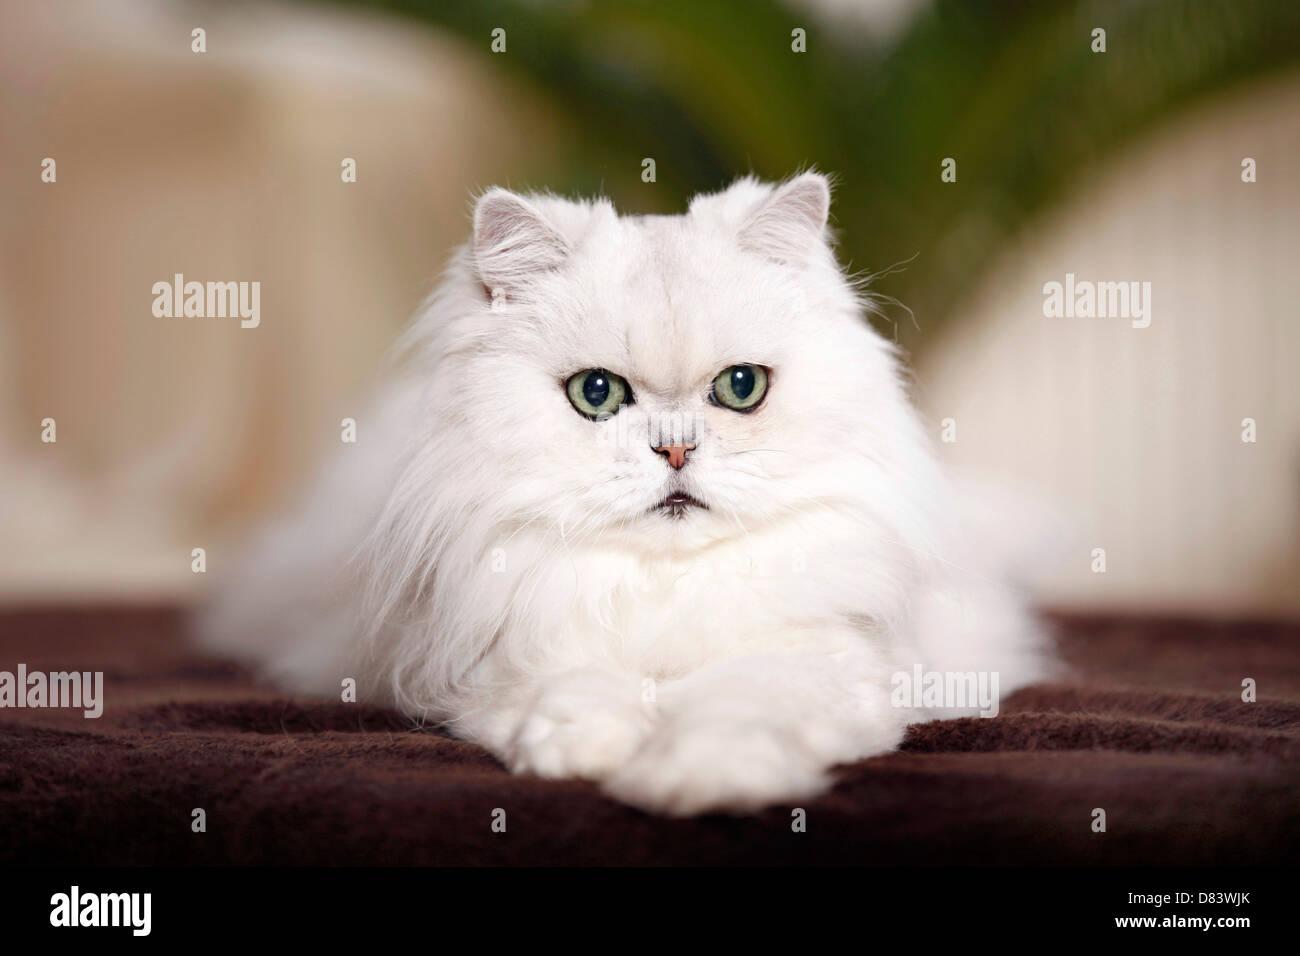 Chinchilla Persian Cat Stock Royalty Free Image